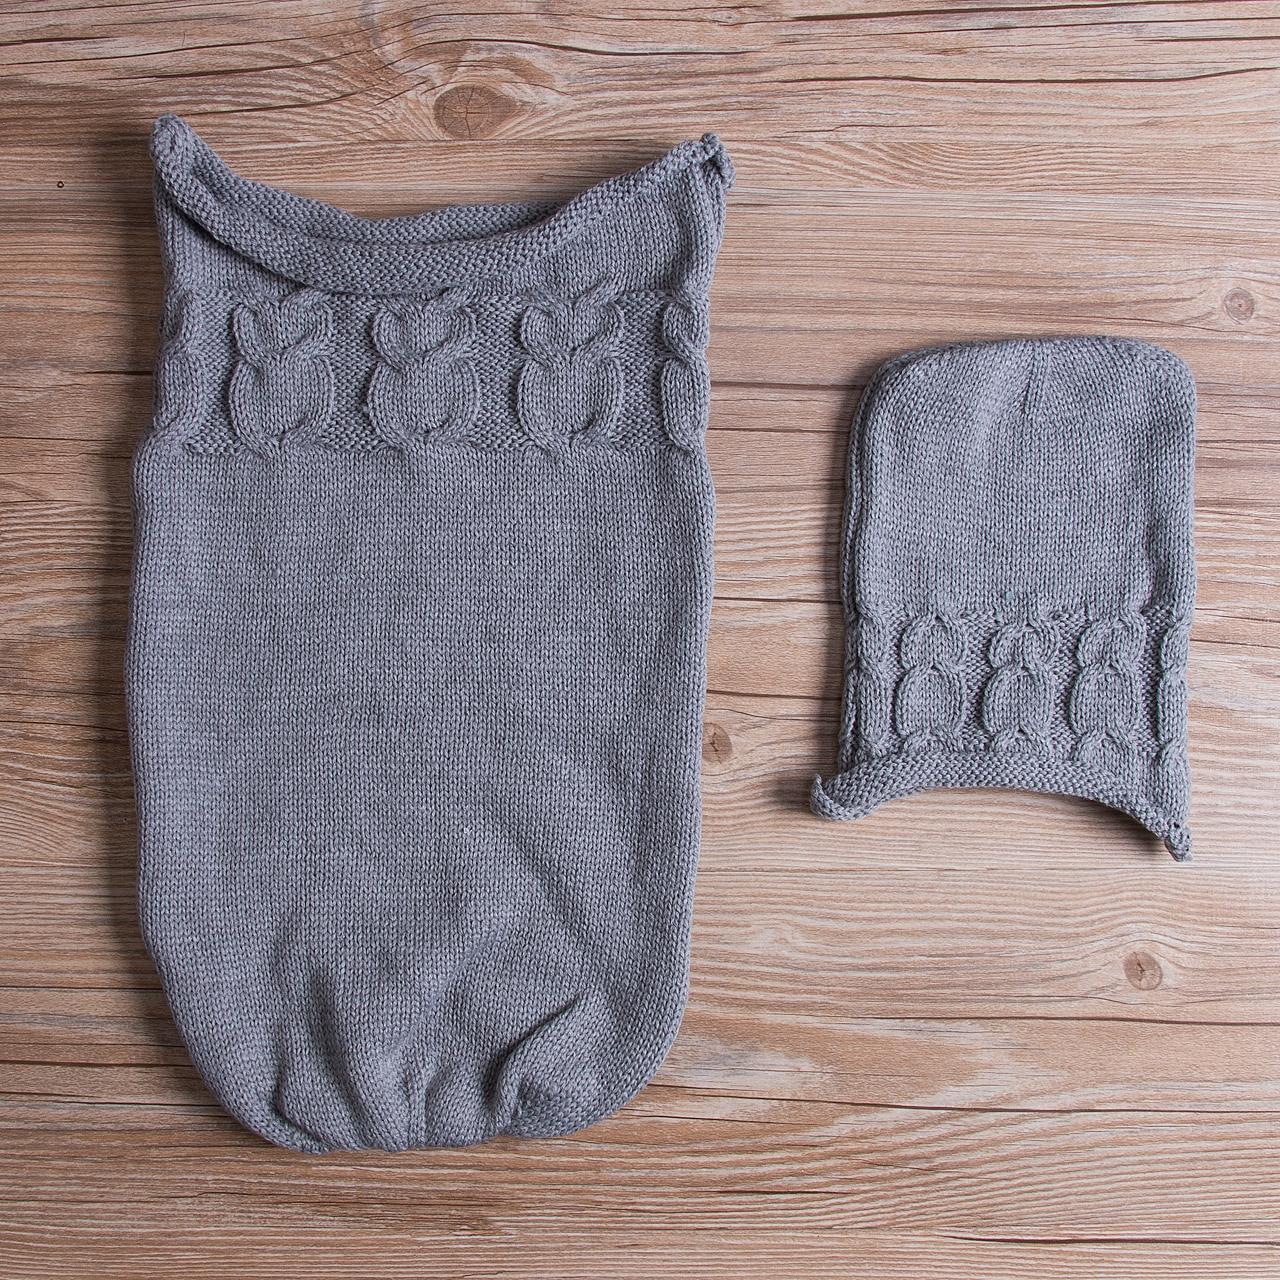 Infant Baby Newborn Sleeping Bag Swaddle Blanket Stroller Wrap Knit ...